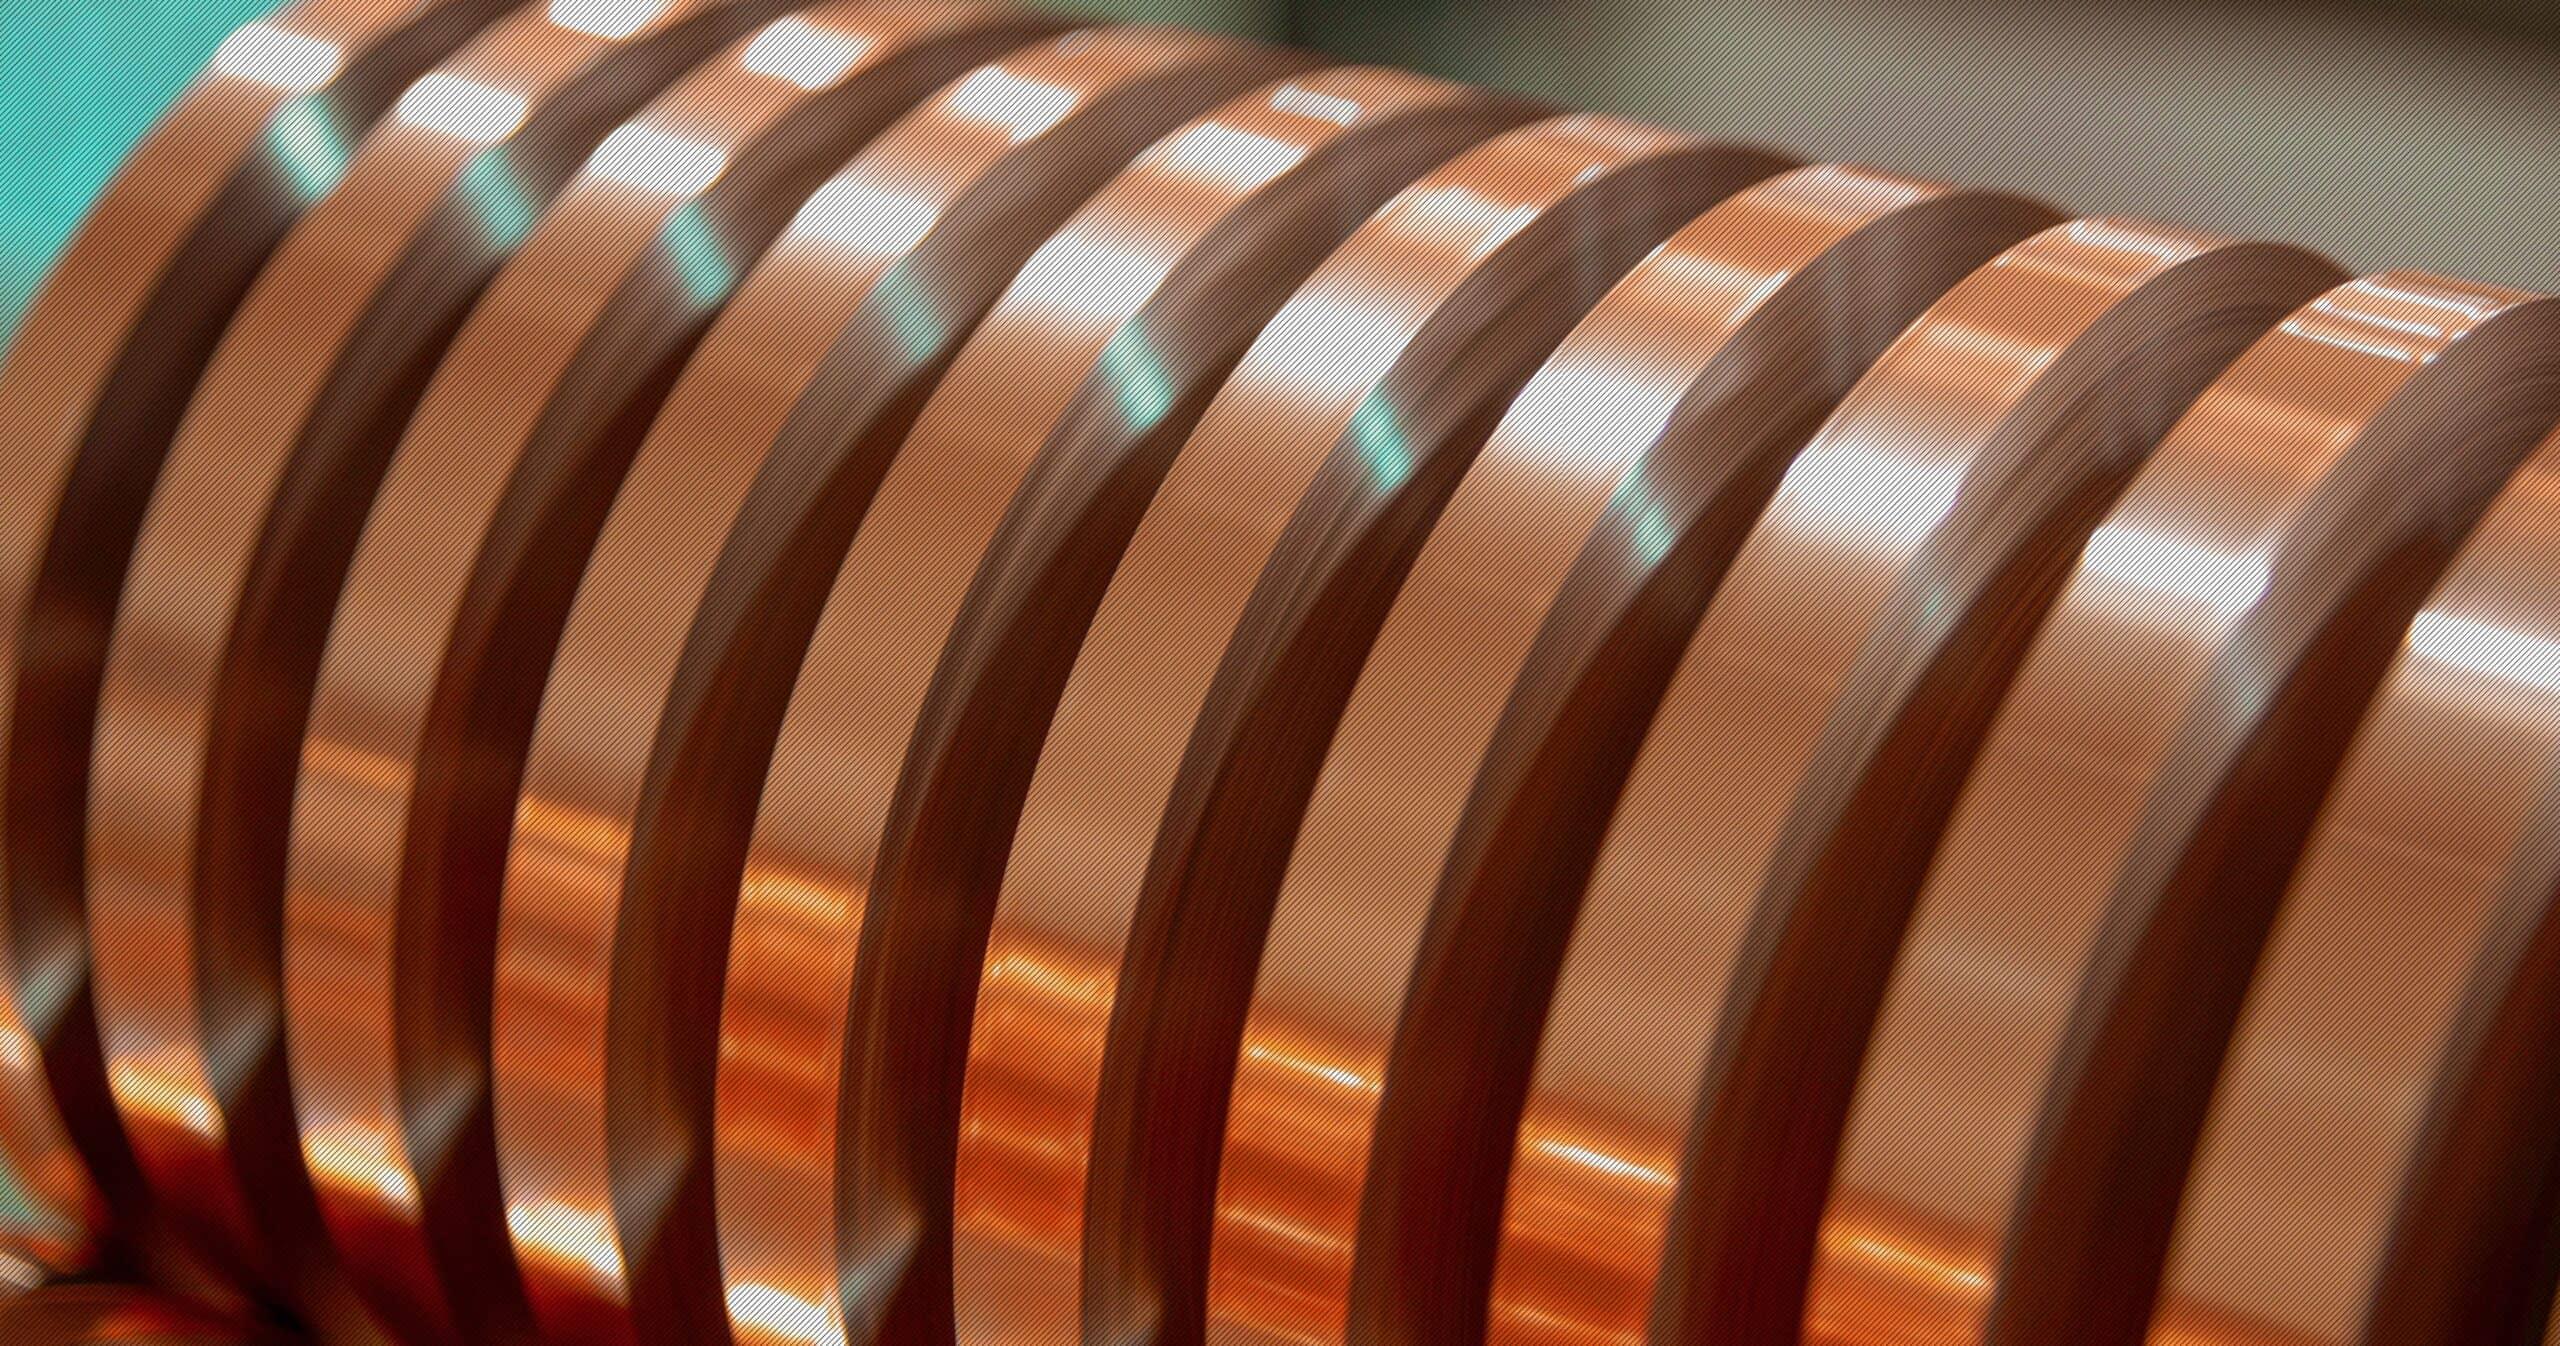 Copper Foil / Polyester Film Tape